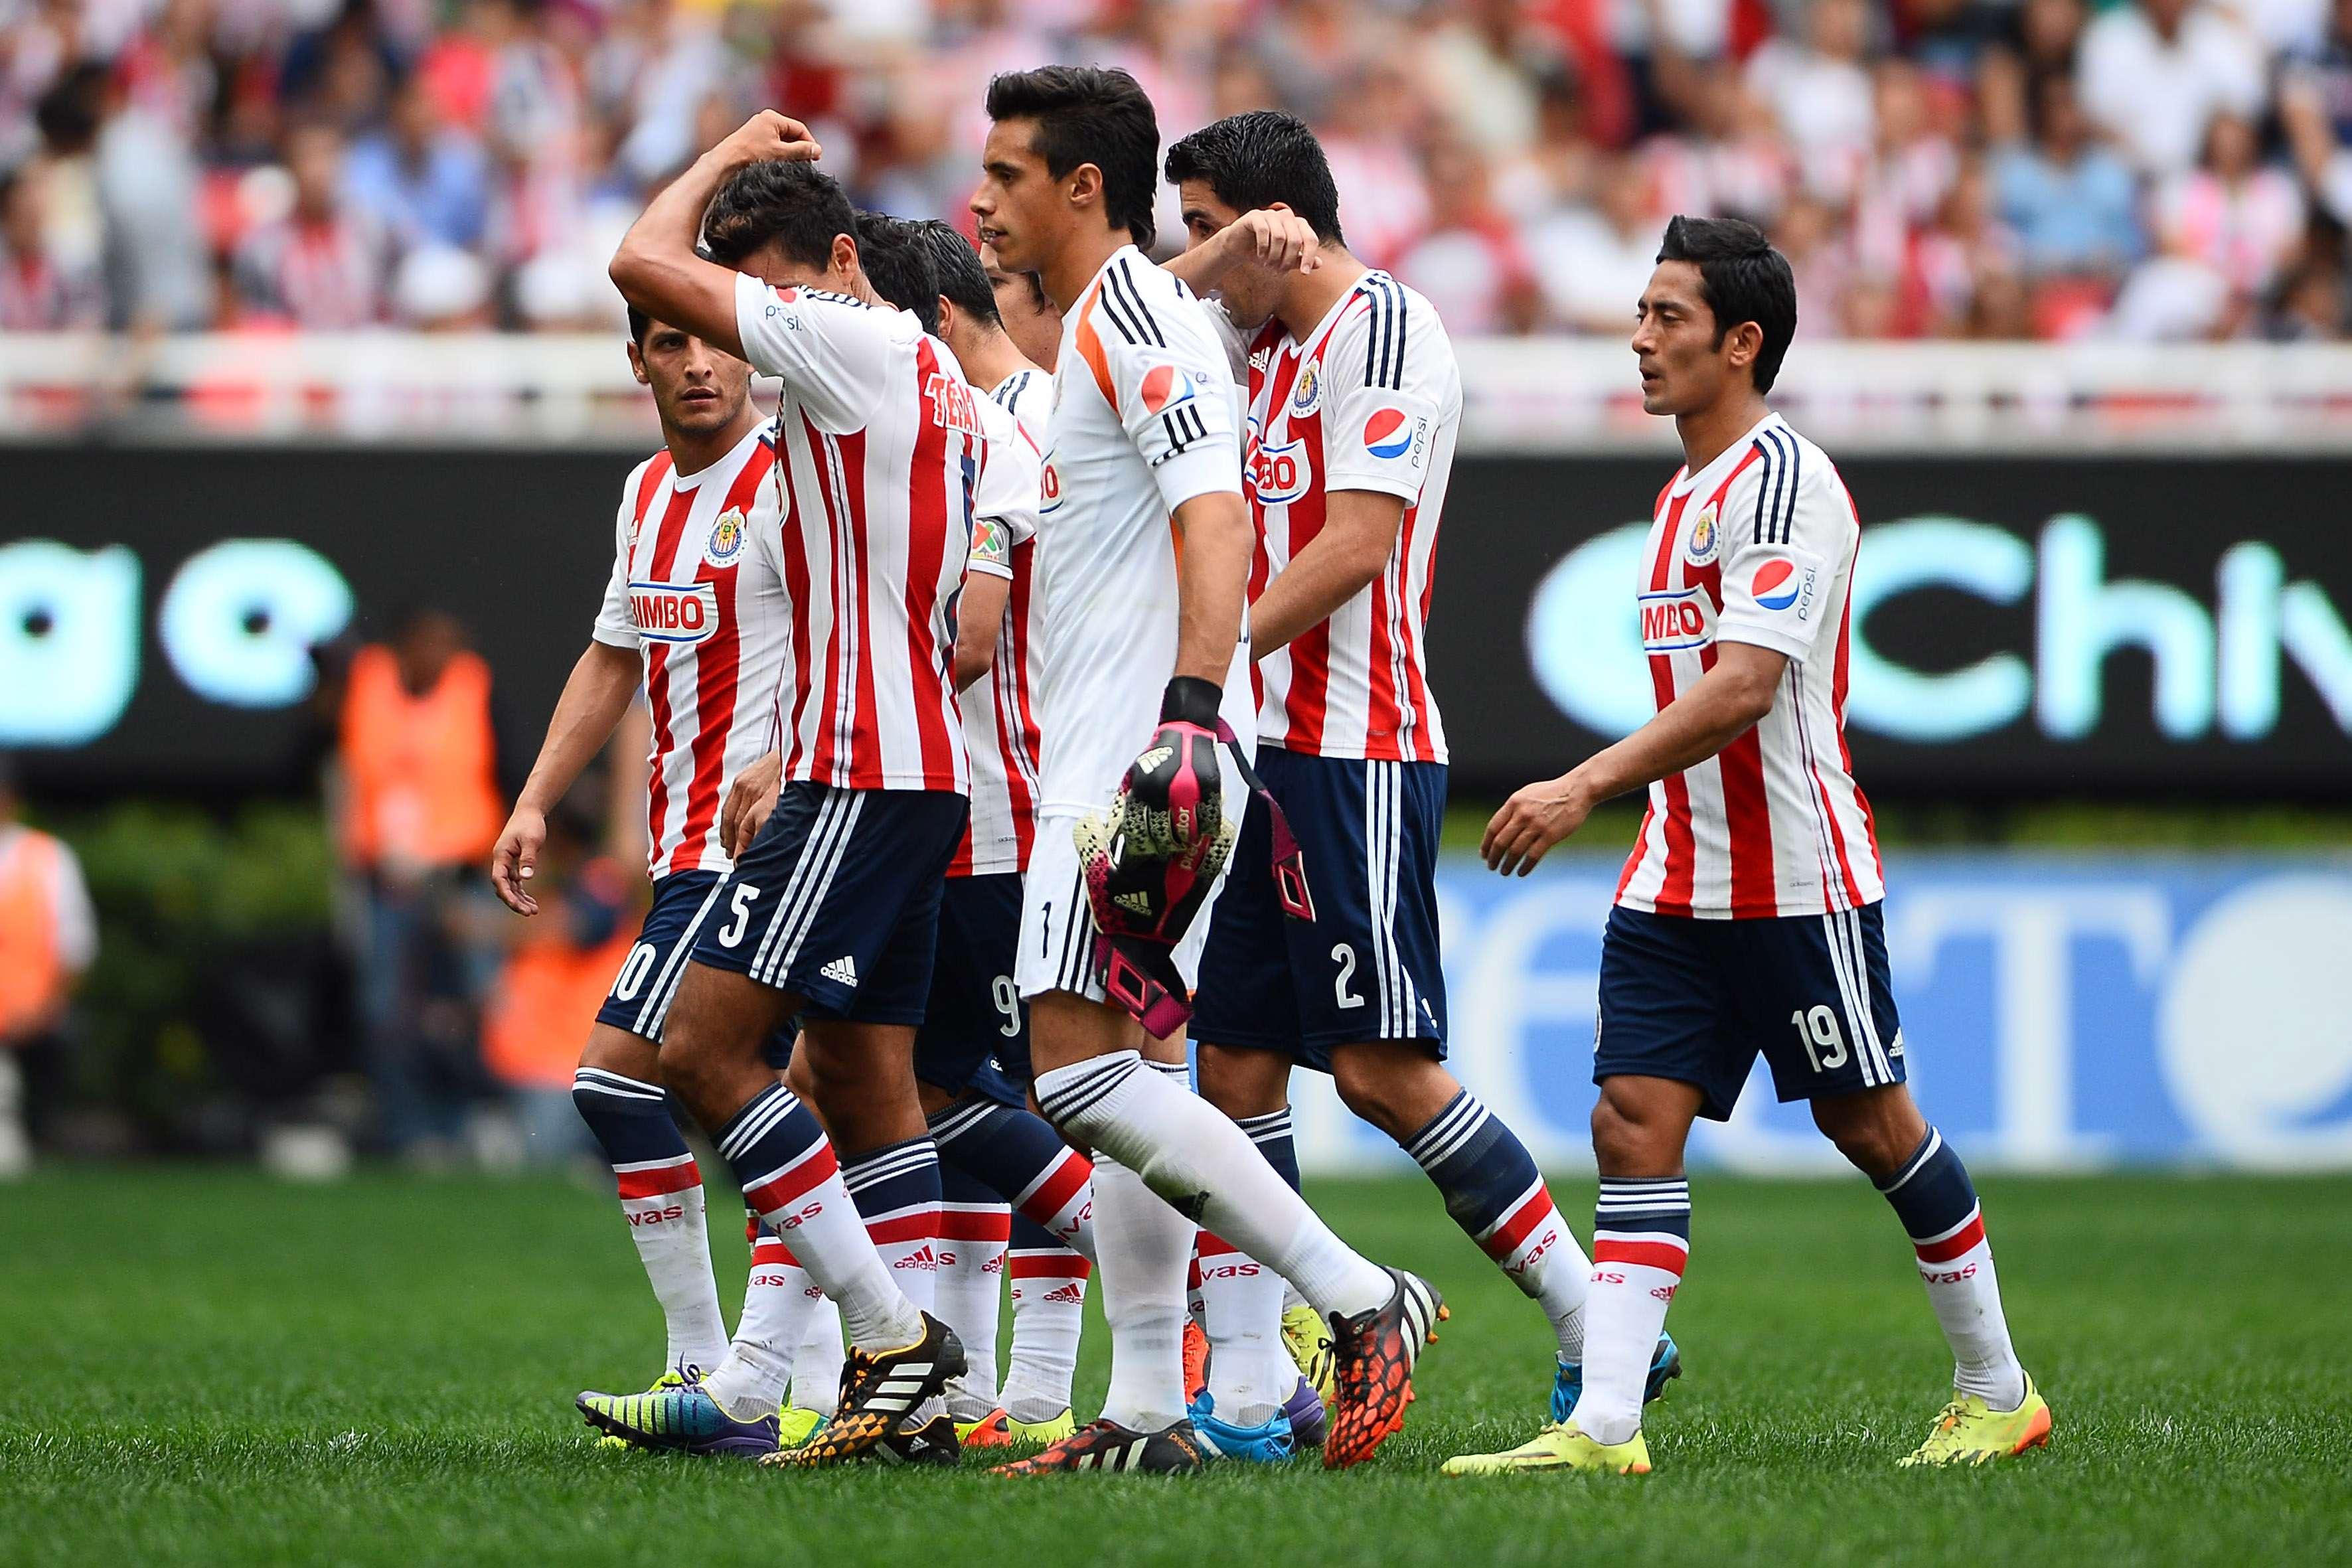 Foto: Mexsport/Imago7